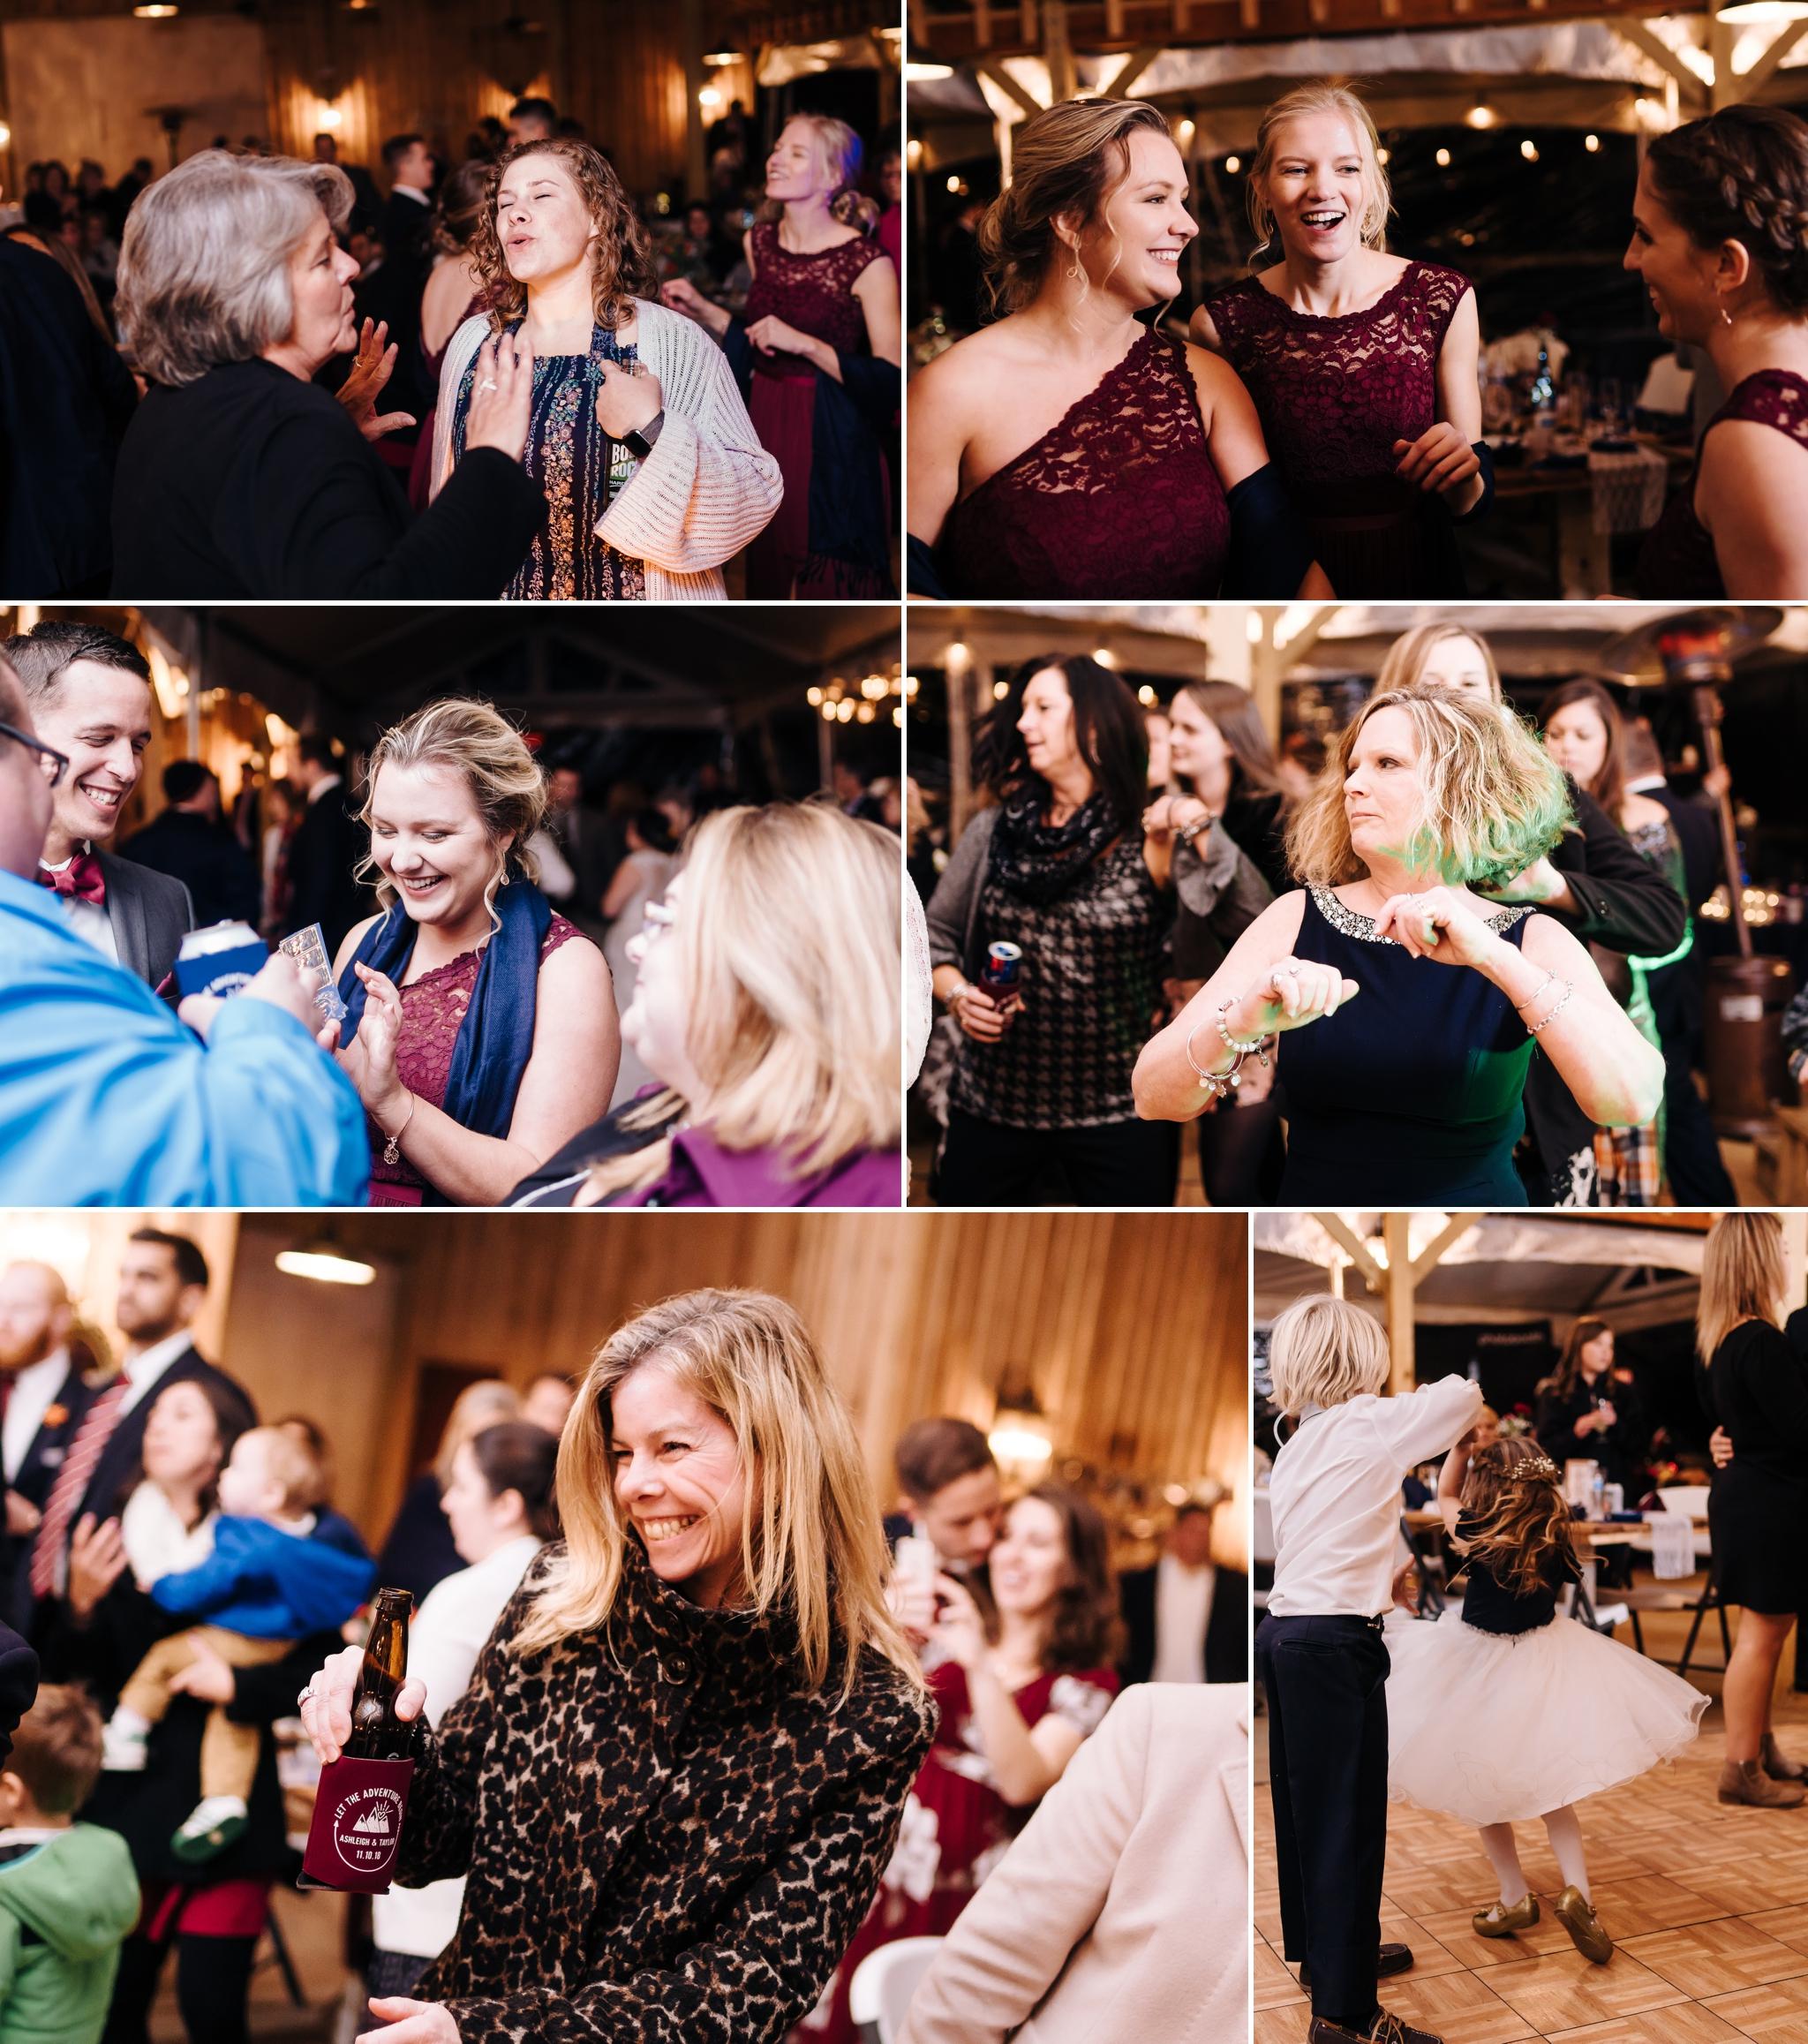 Wedding_reception_dancing_at_wolftrap_farms_by_jonathan_and_hannah_photography